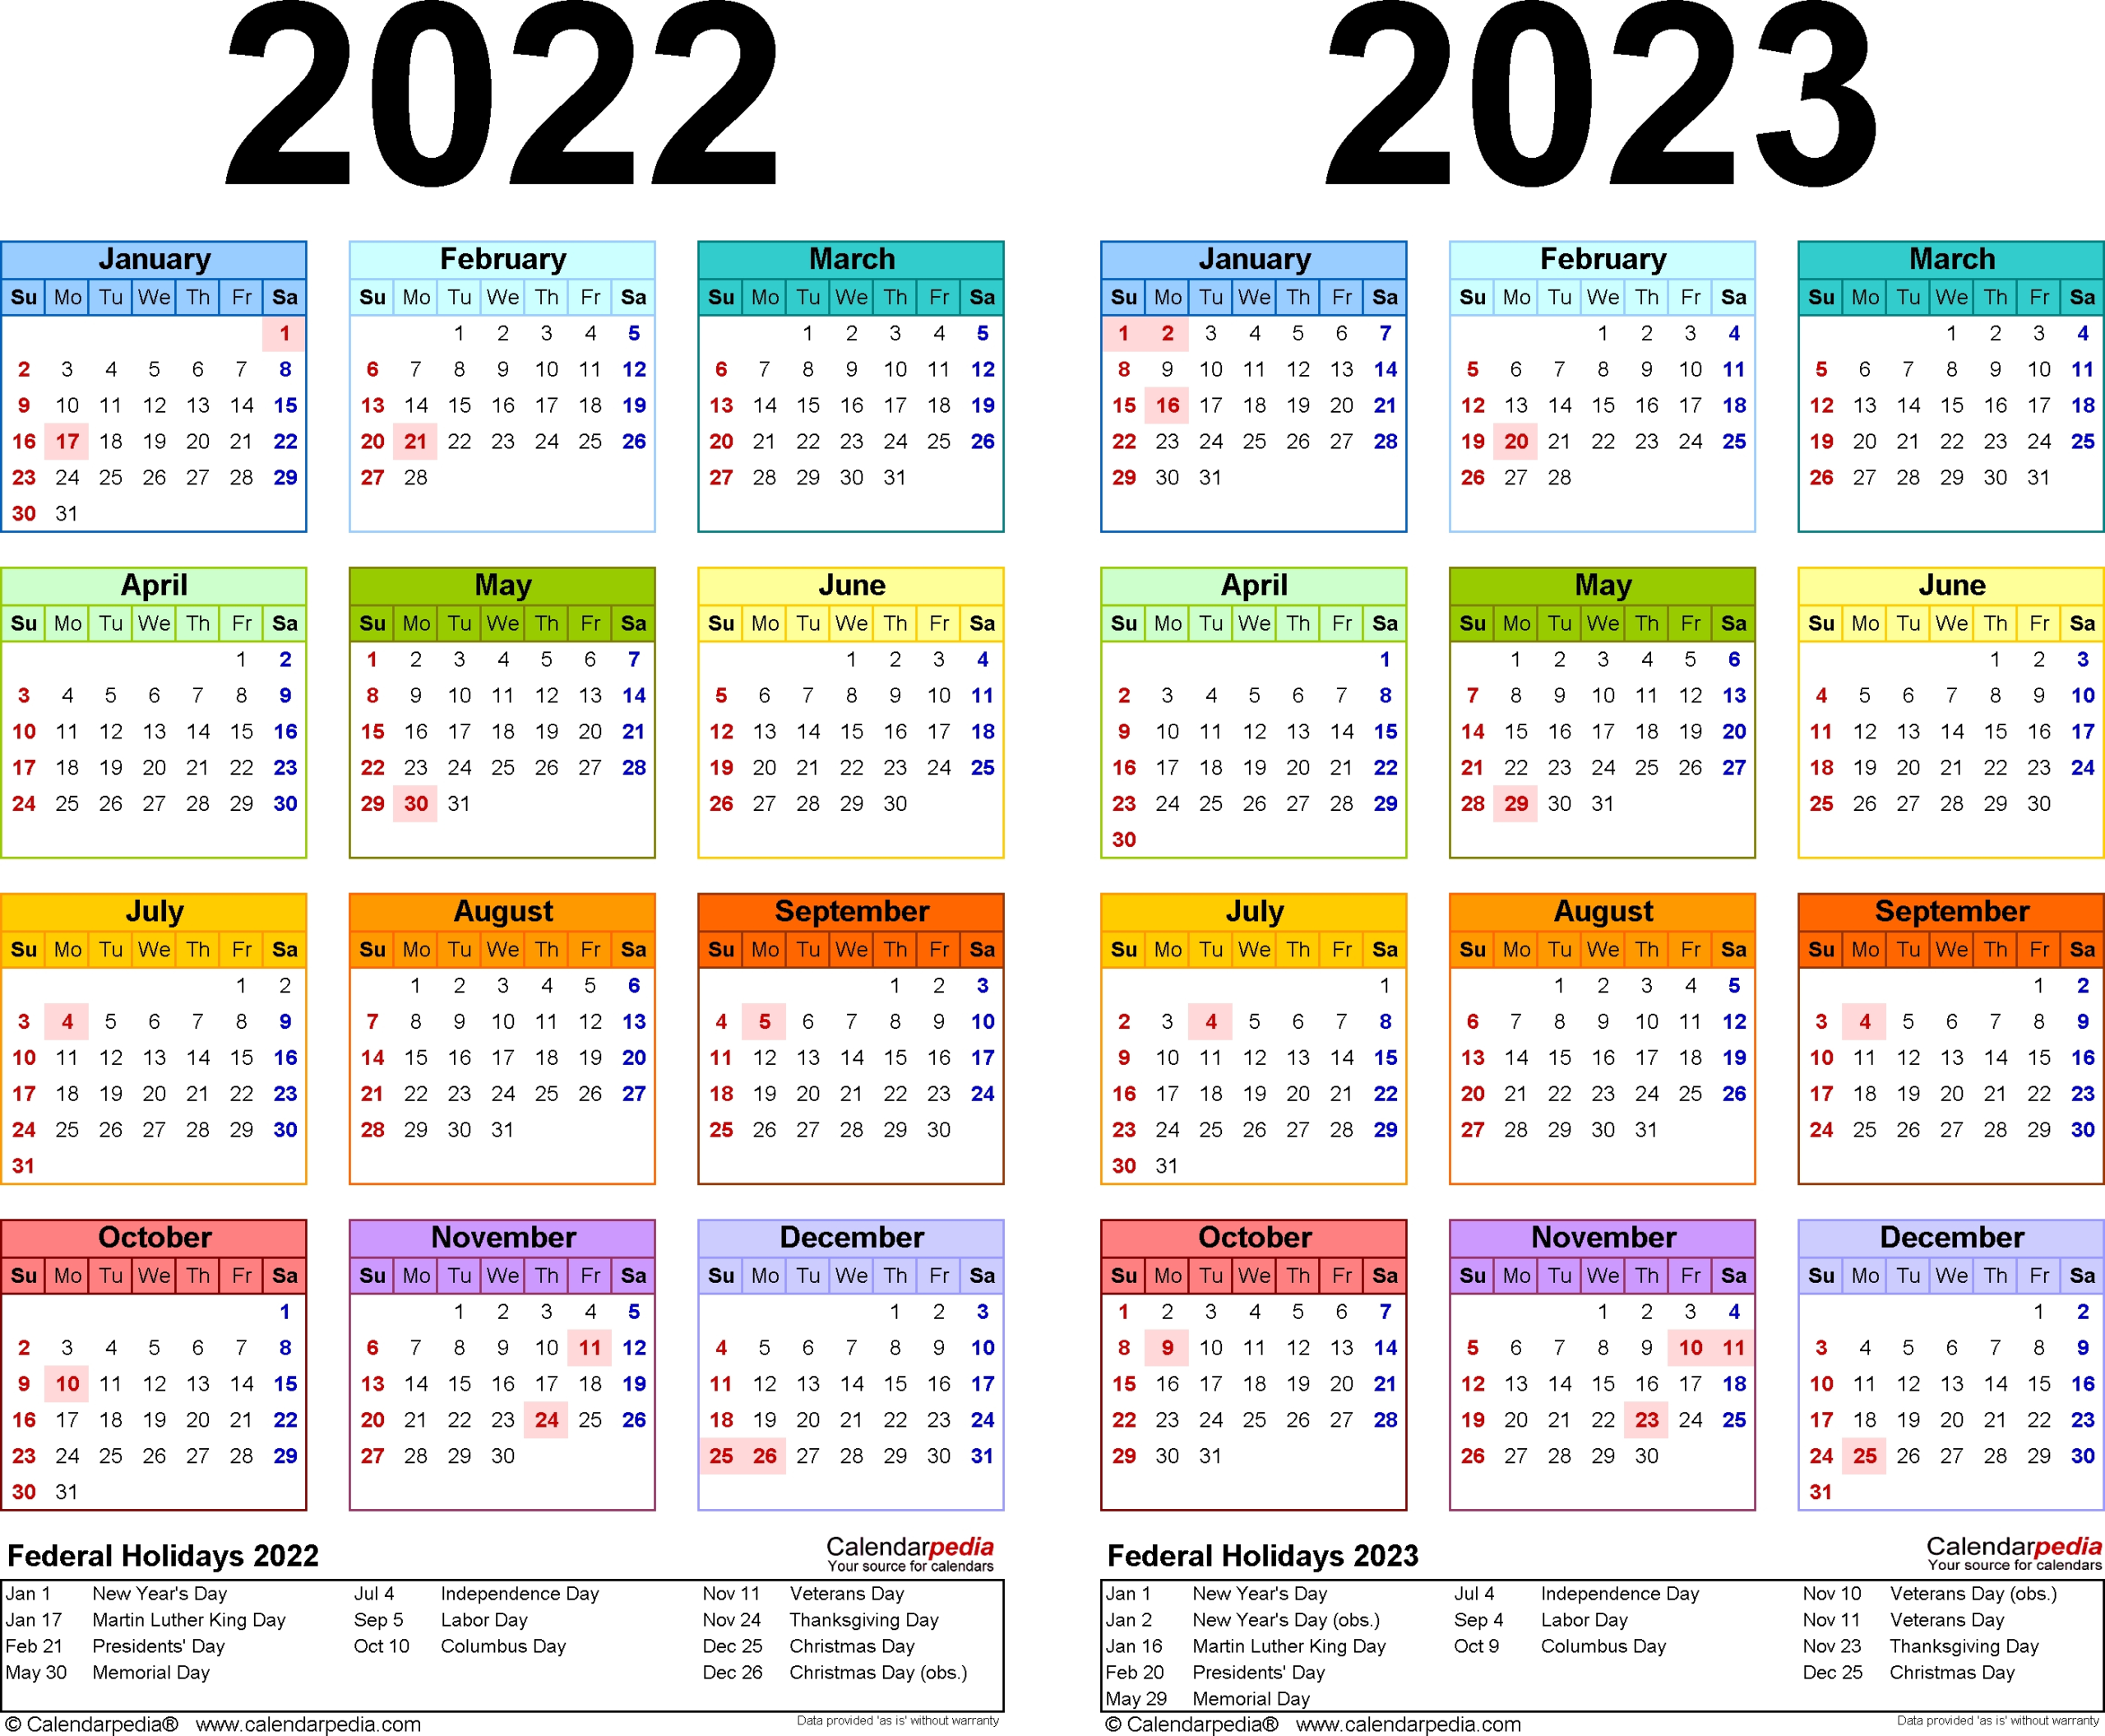 3 Year Calendar 2021 To 2023 | Month Calendar Printable intended for 2021 3 Month Monthly Printable Calendars